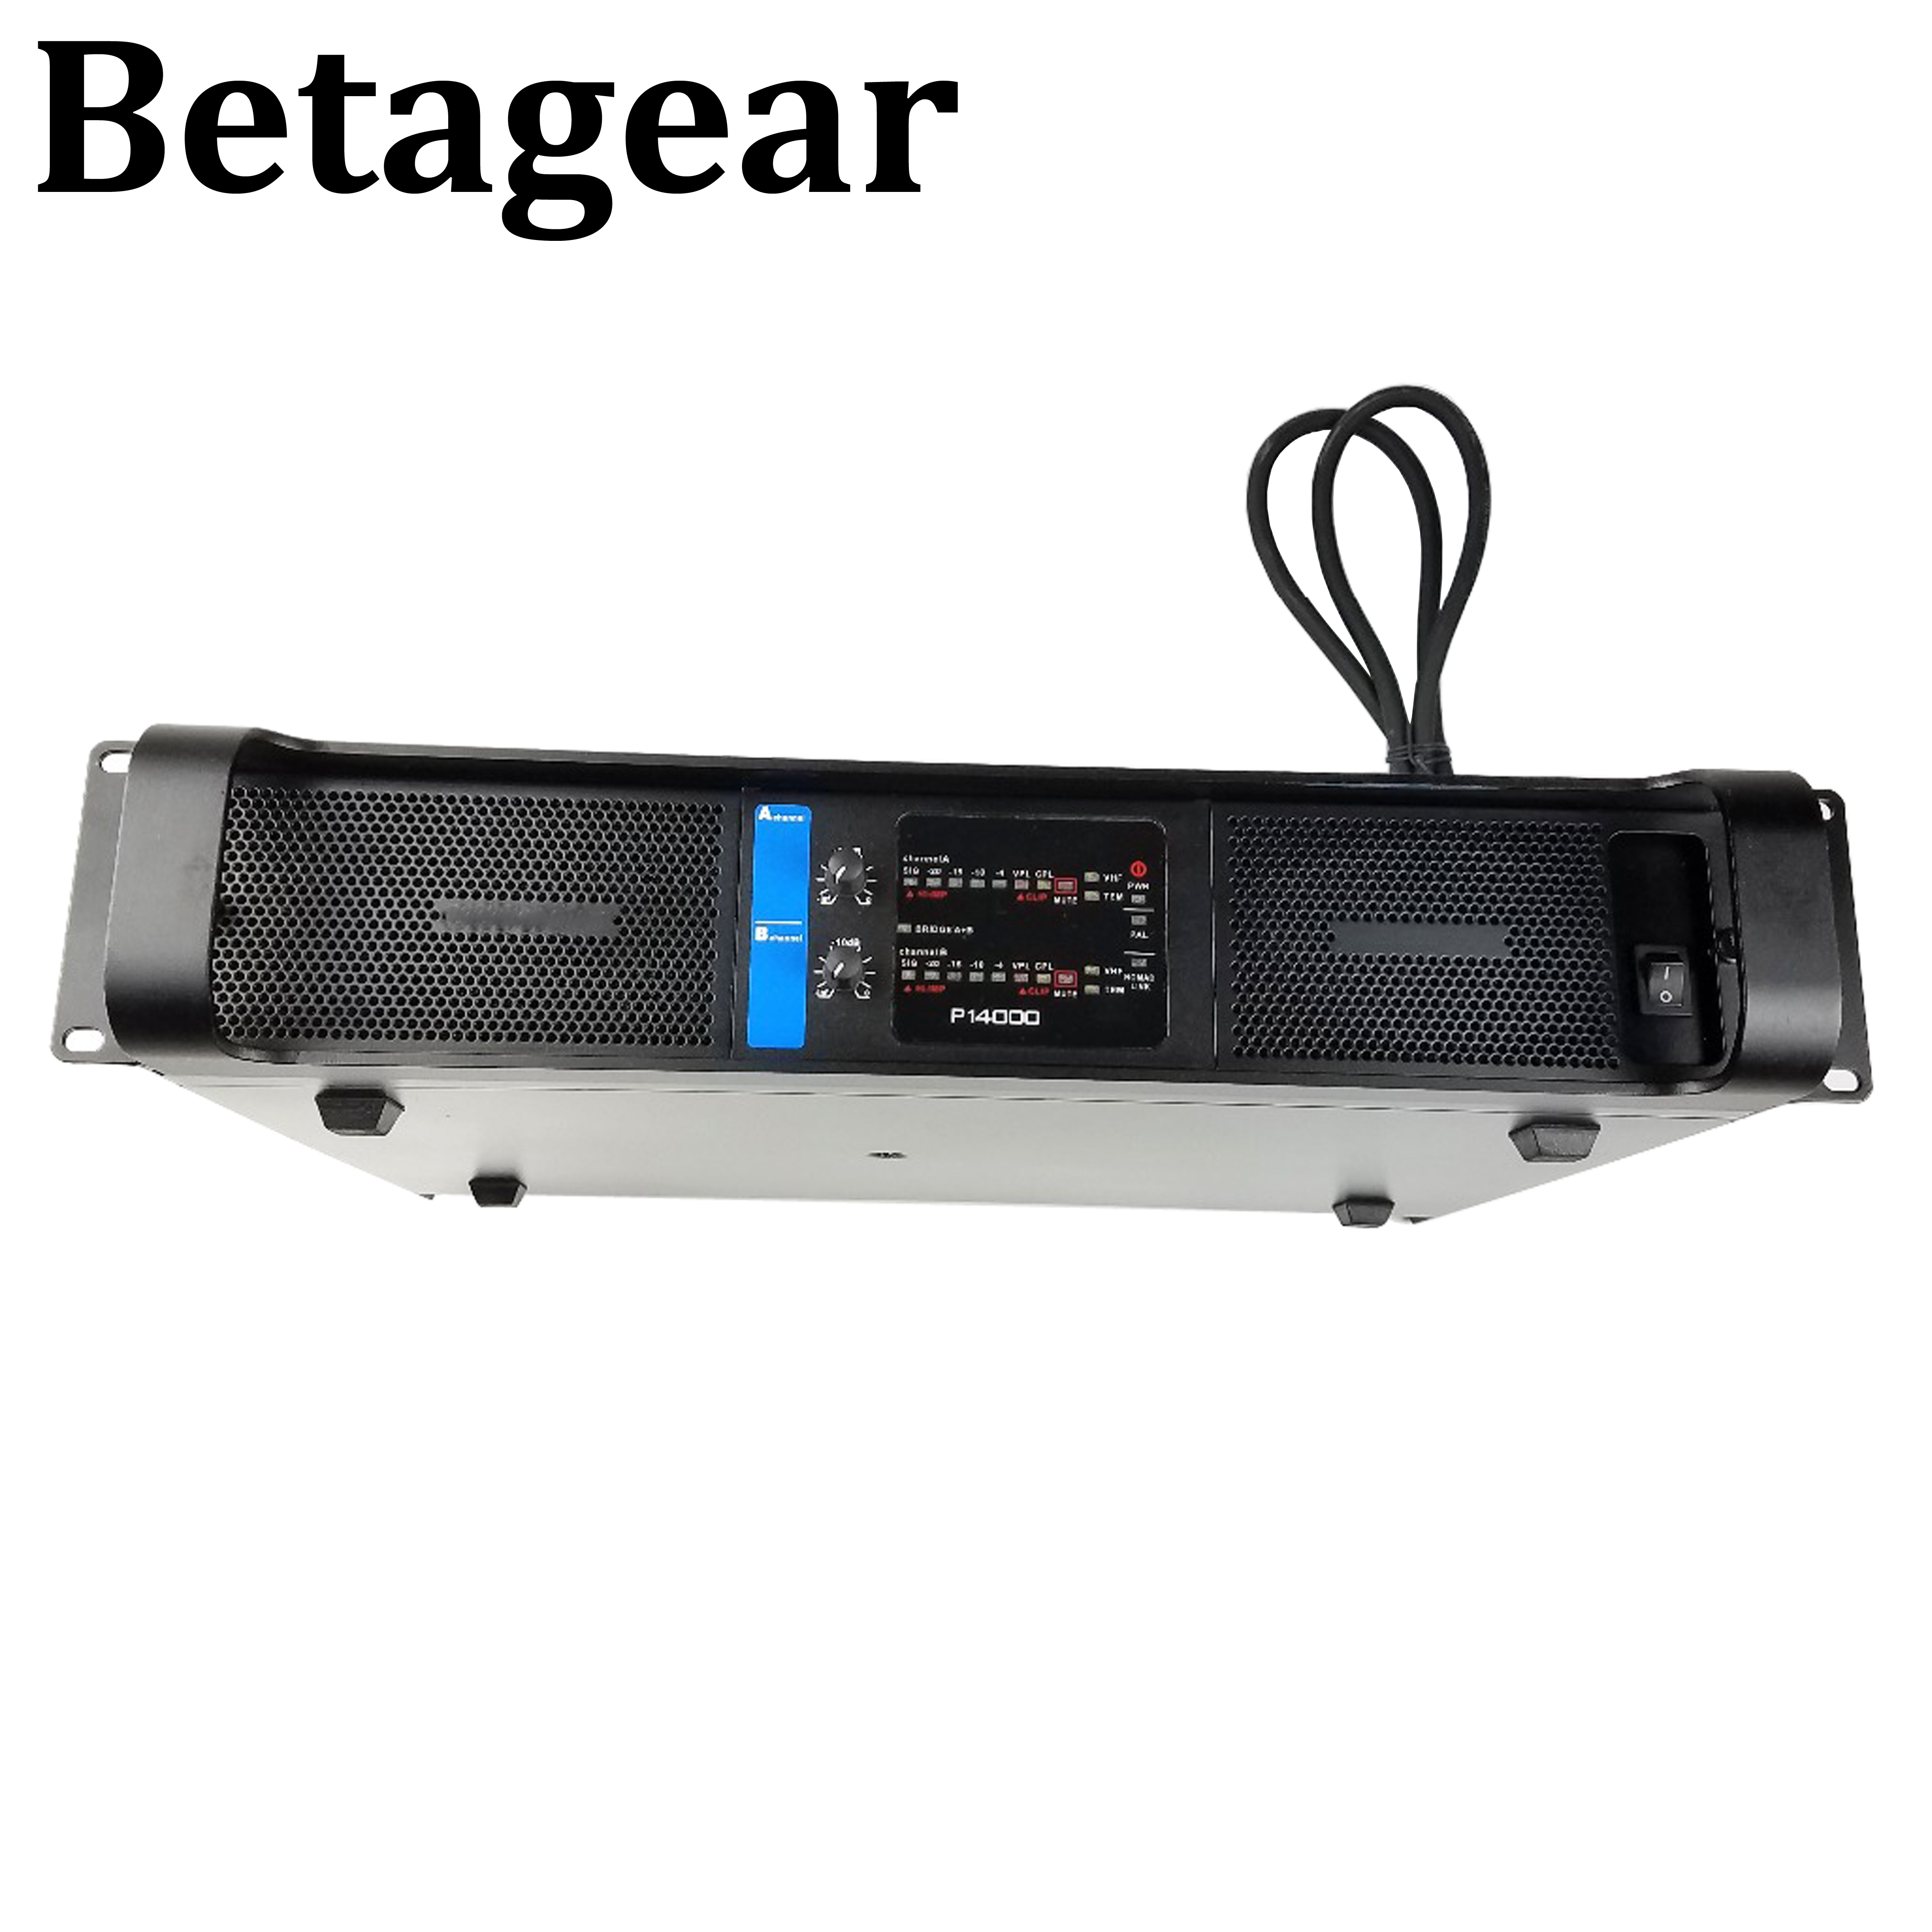 Betagear Professional amplifier 2350w x2 channel Power Amplifier subwoofer 14000q  professional stage audio power amplifier